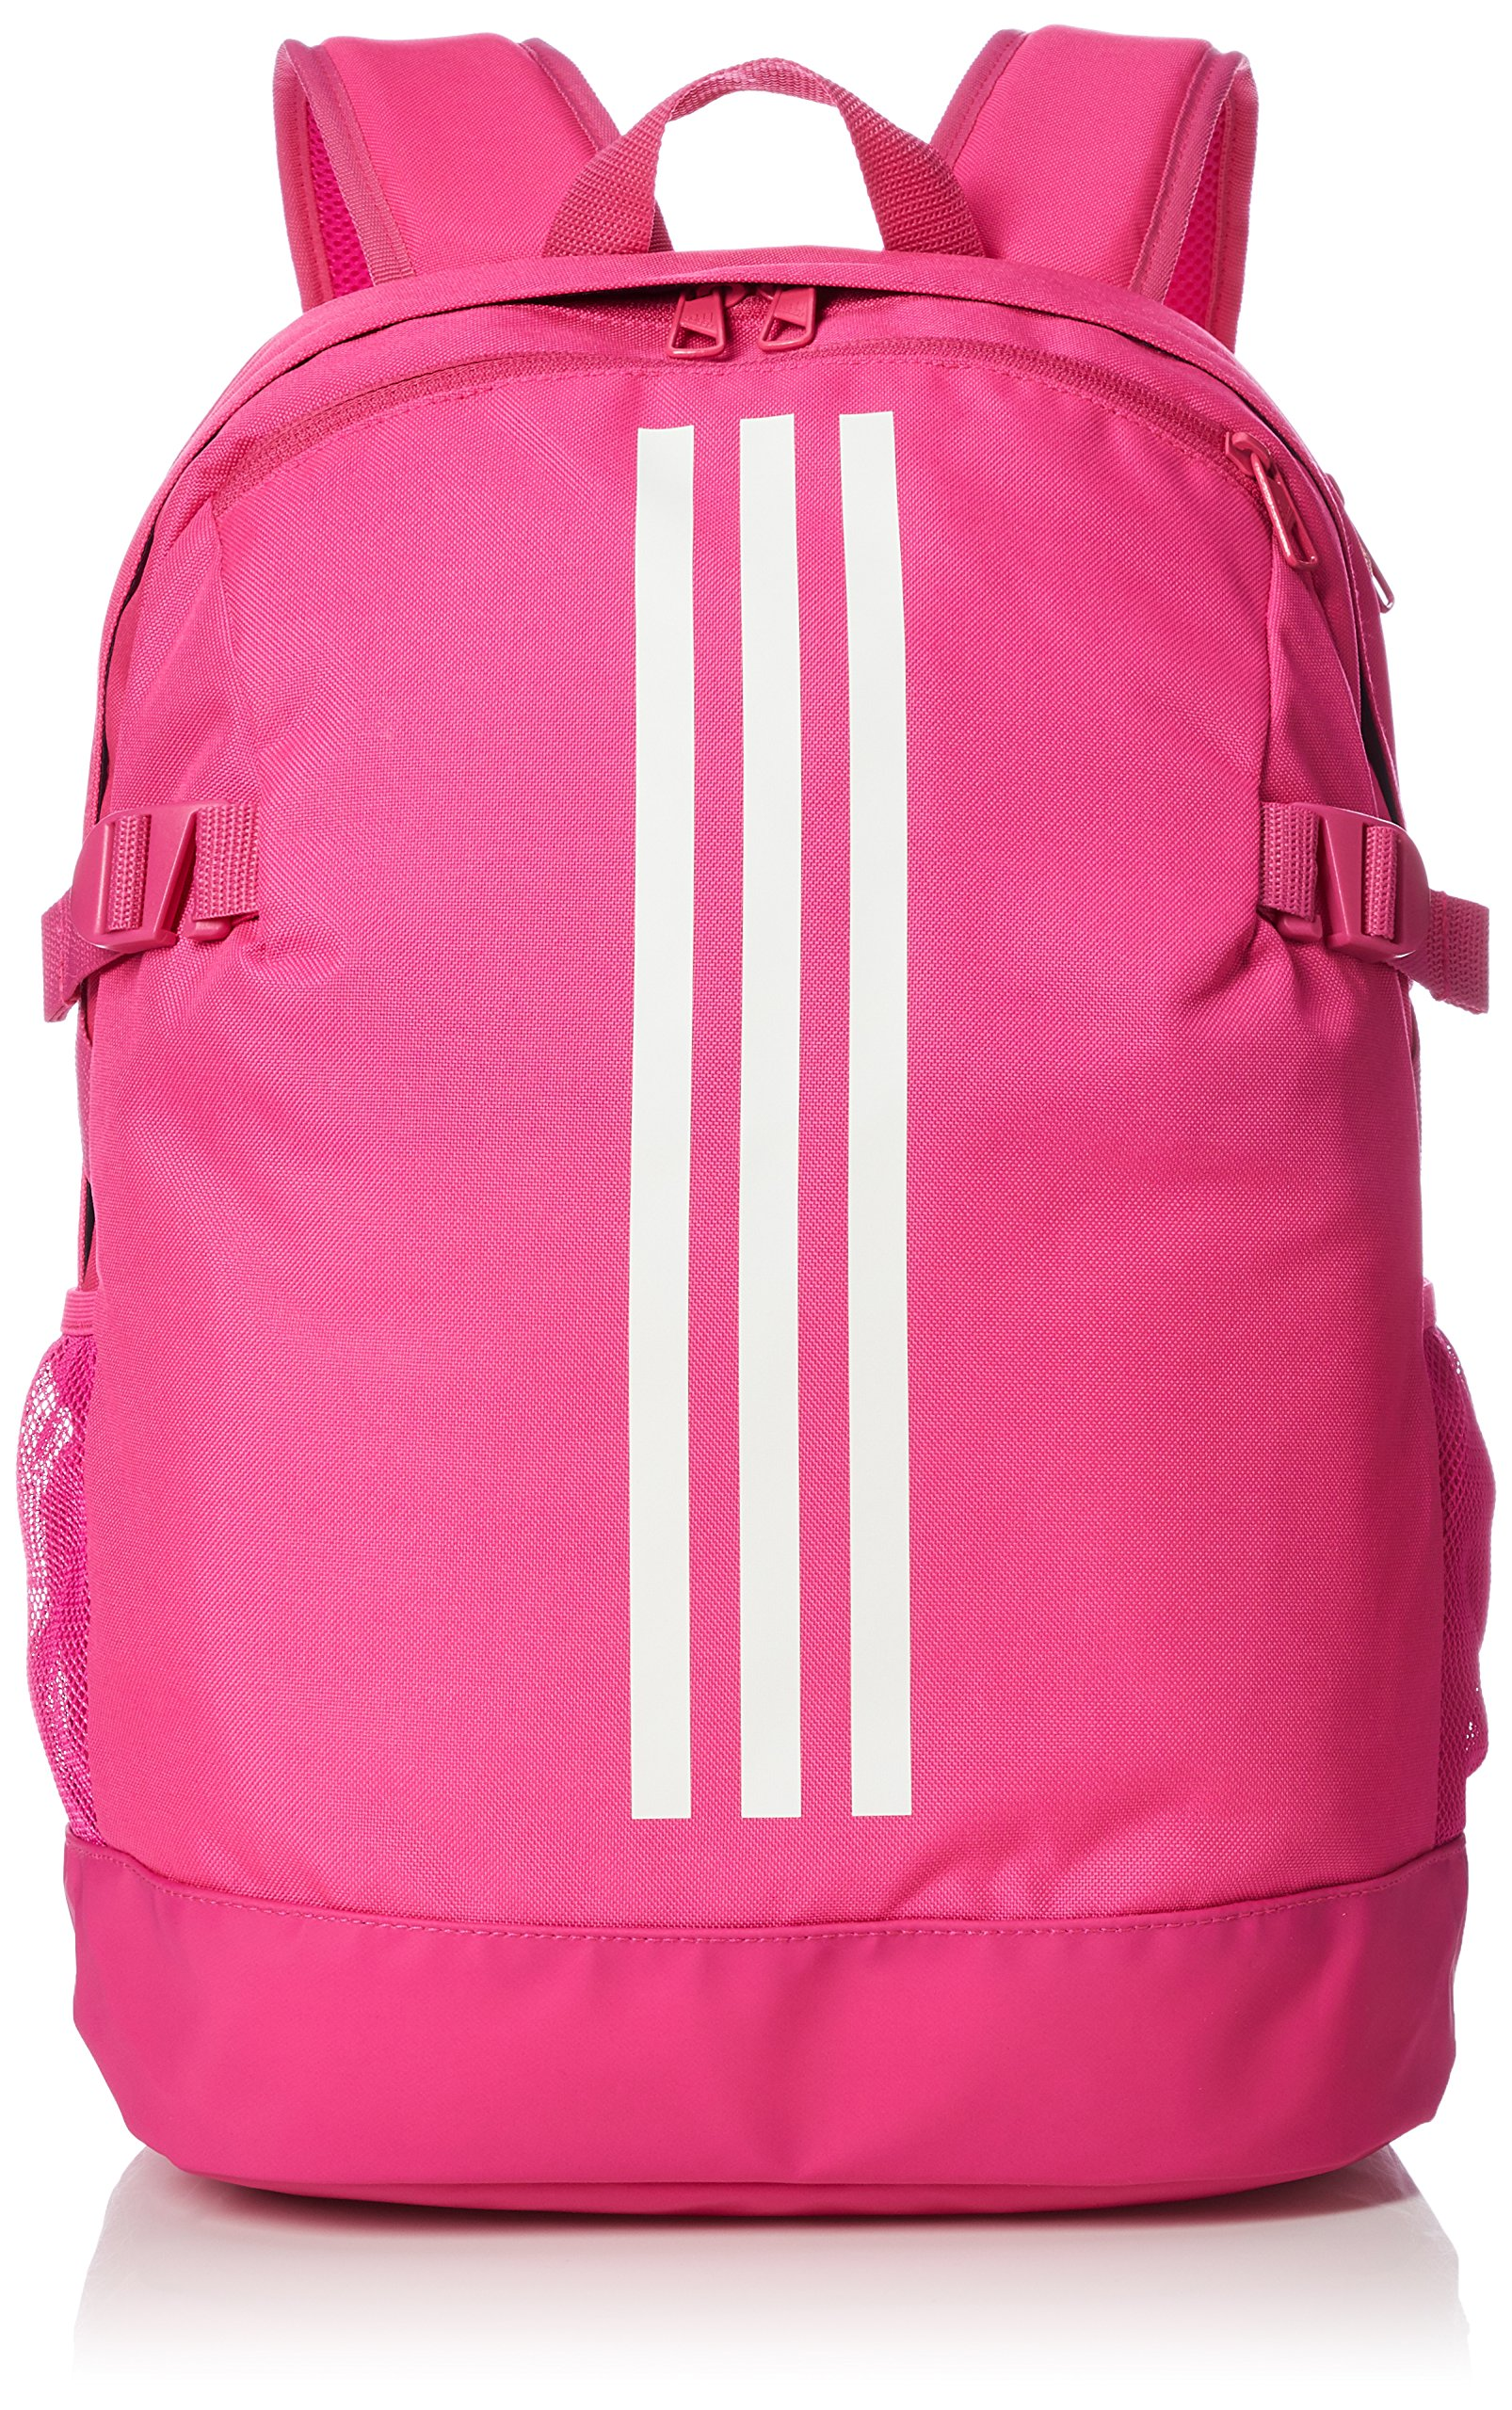 adidas Erwachsene Power IV Rucksack, Shock Pink/White, 16 x 32 x 44 cm